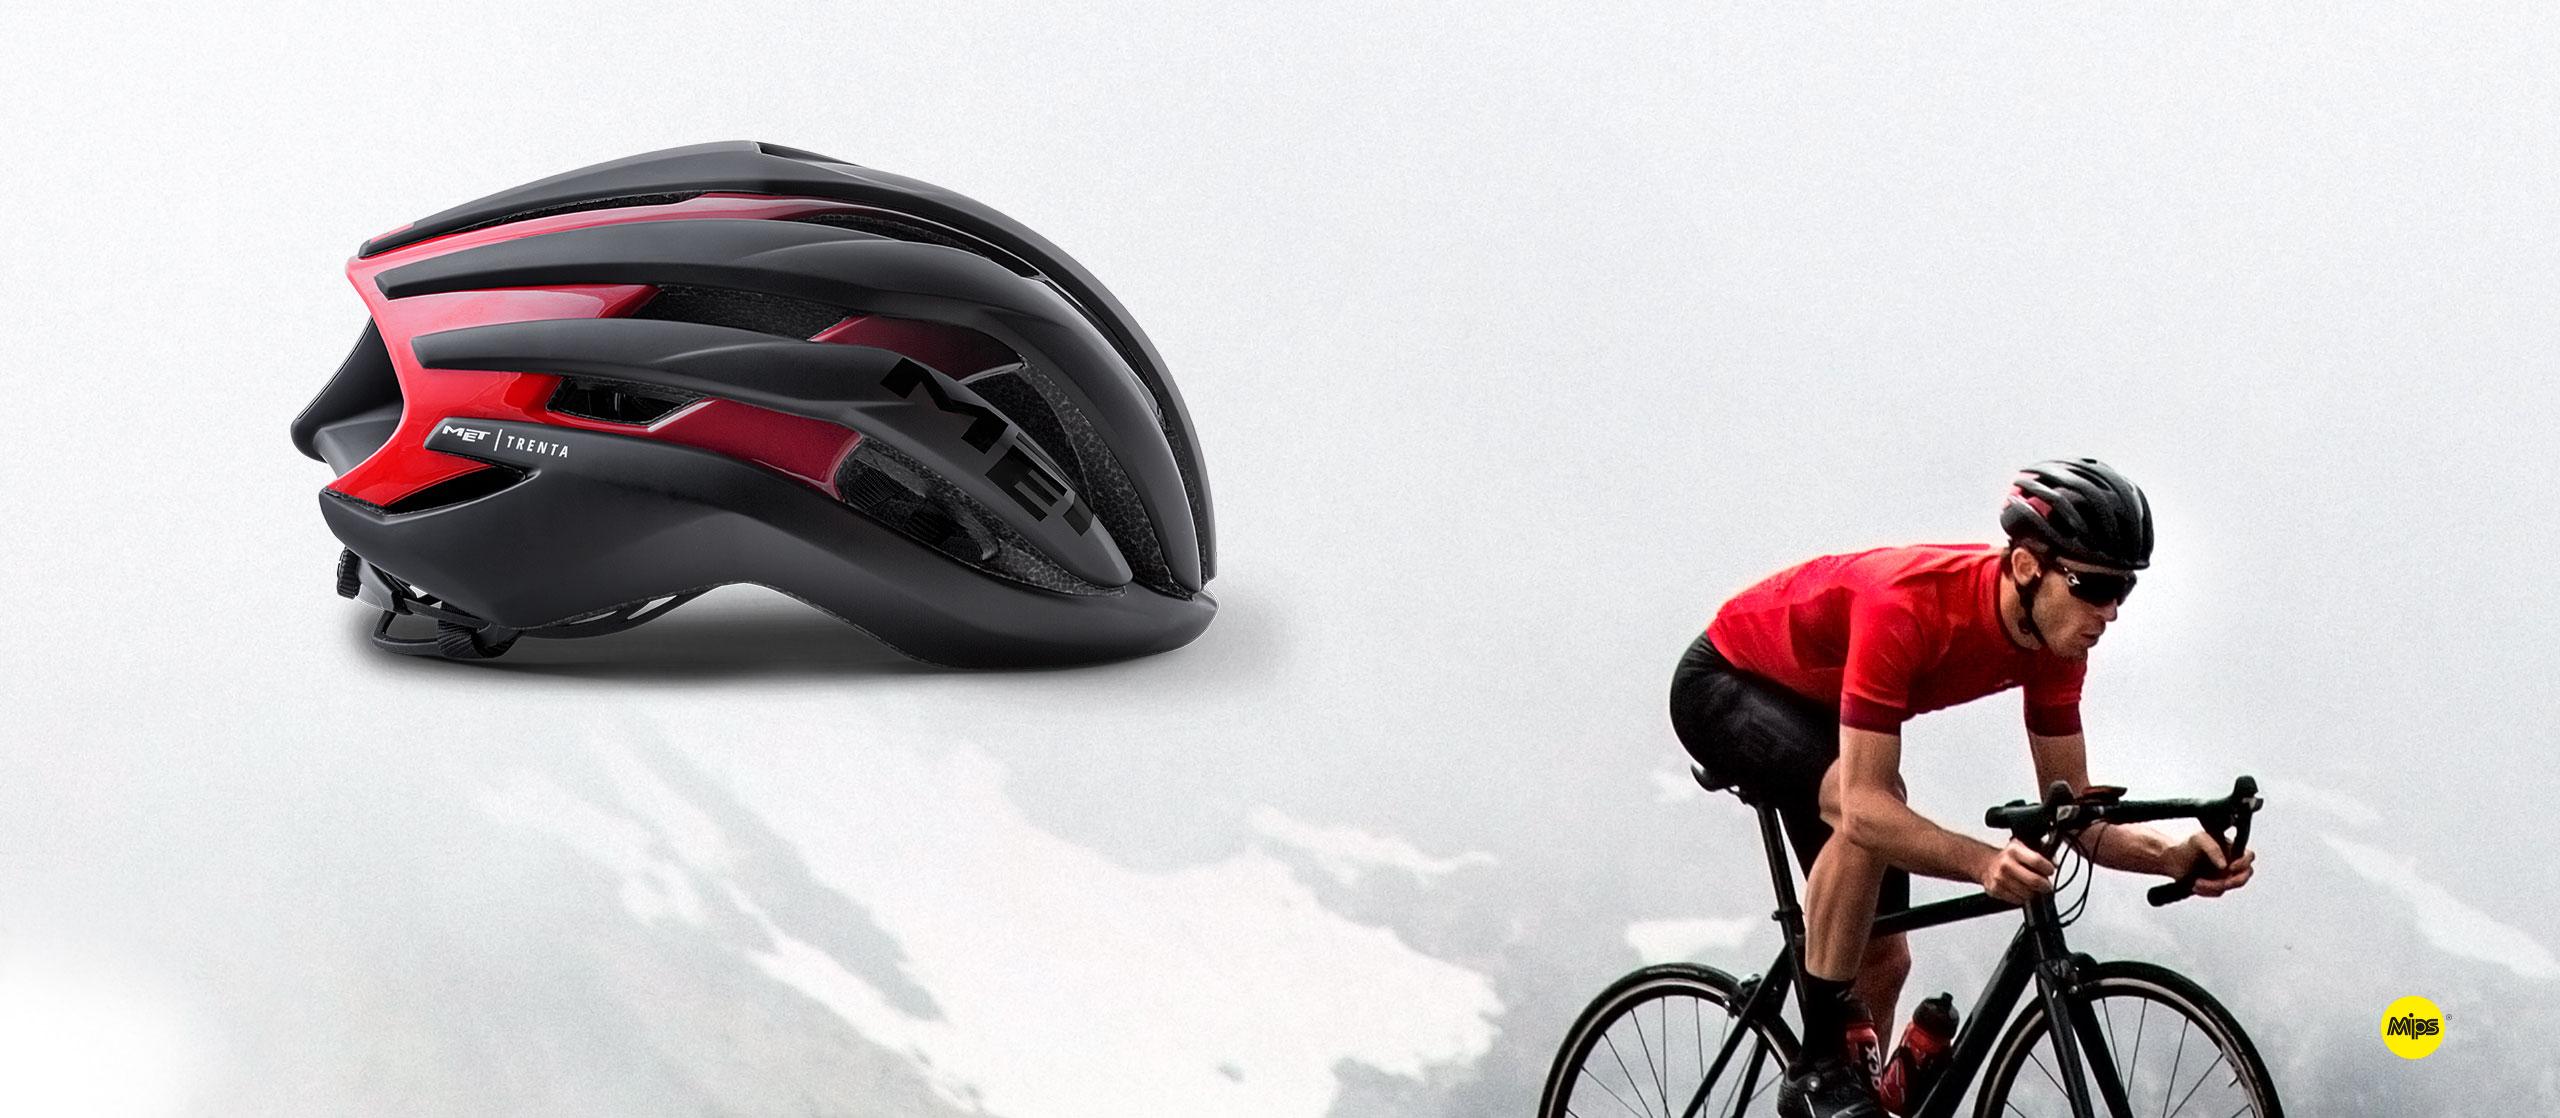 Helmet Farrad Mountain Bike Bicycle Motorbike Scooter Helmet Ladies Men/'s Helmet